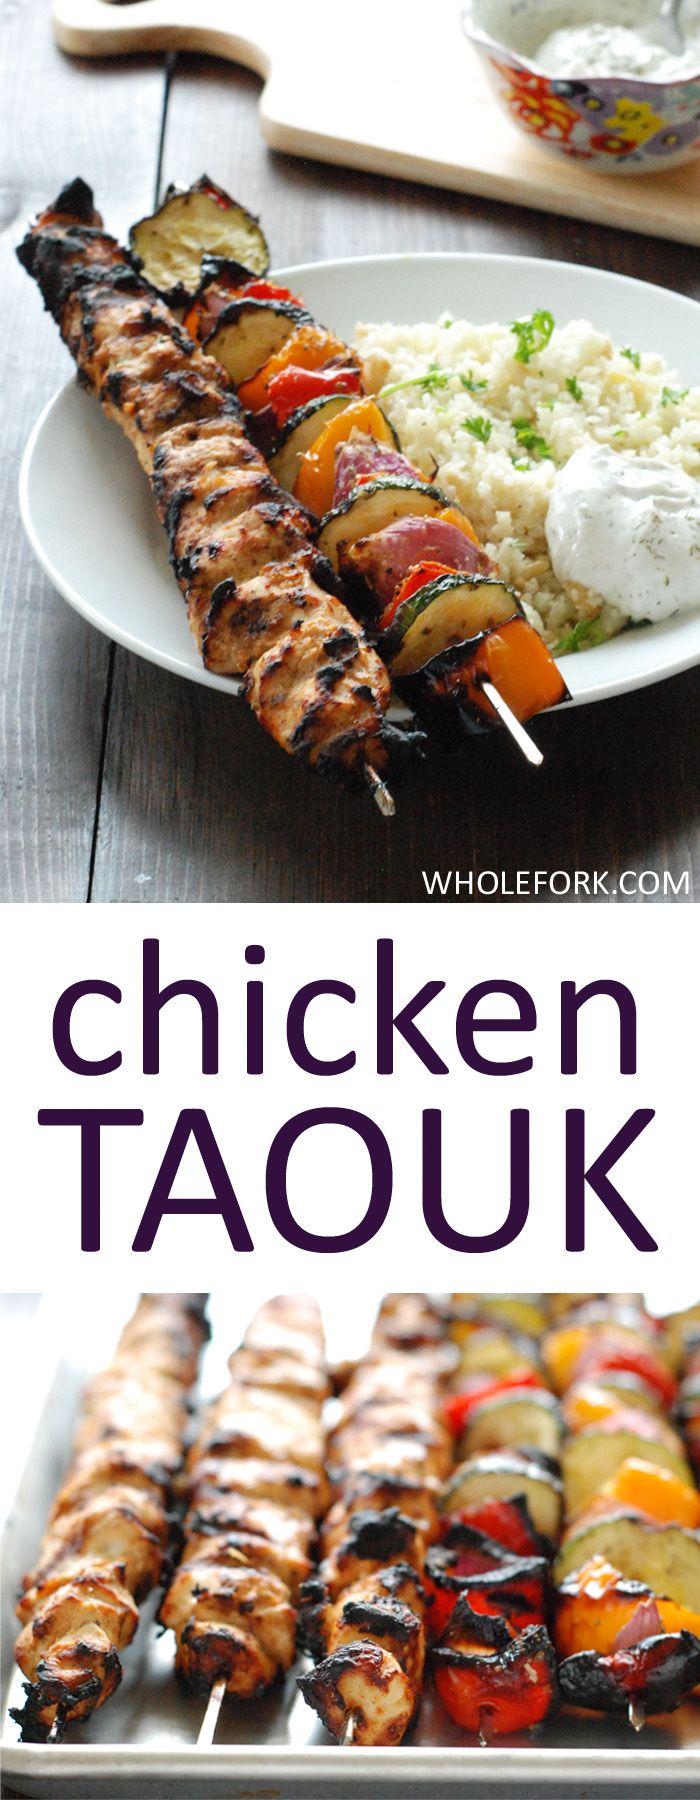 Turkish Chicken Taouk